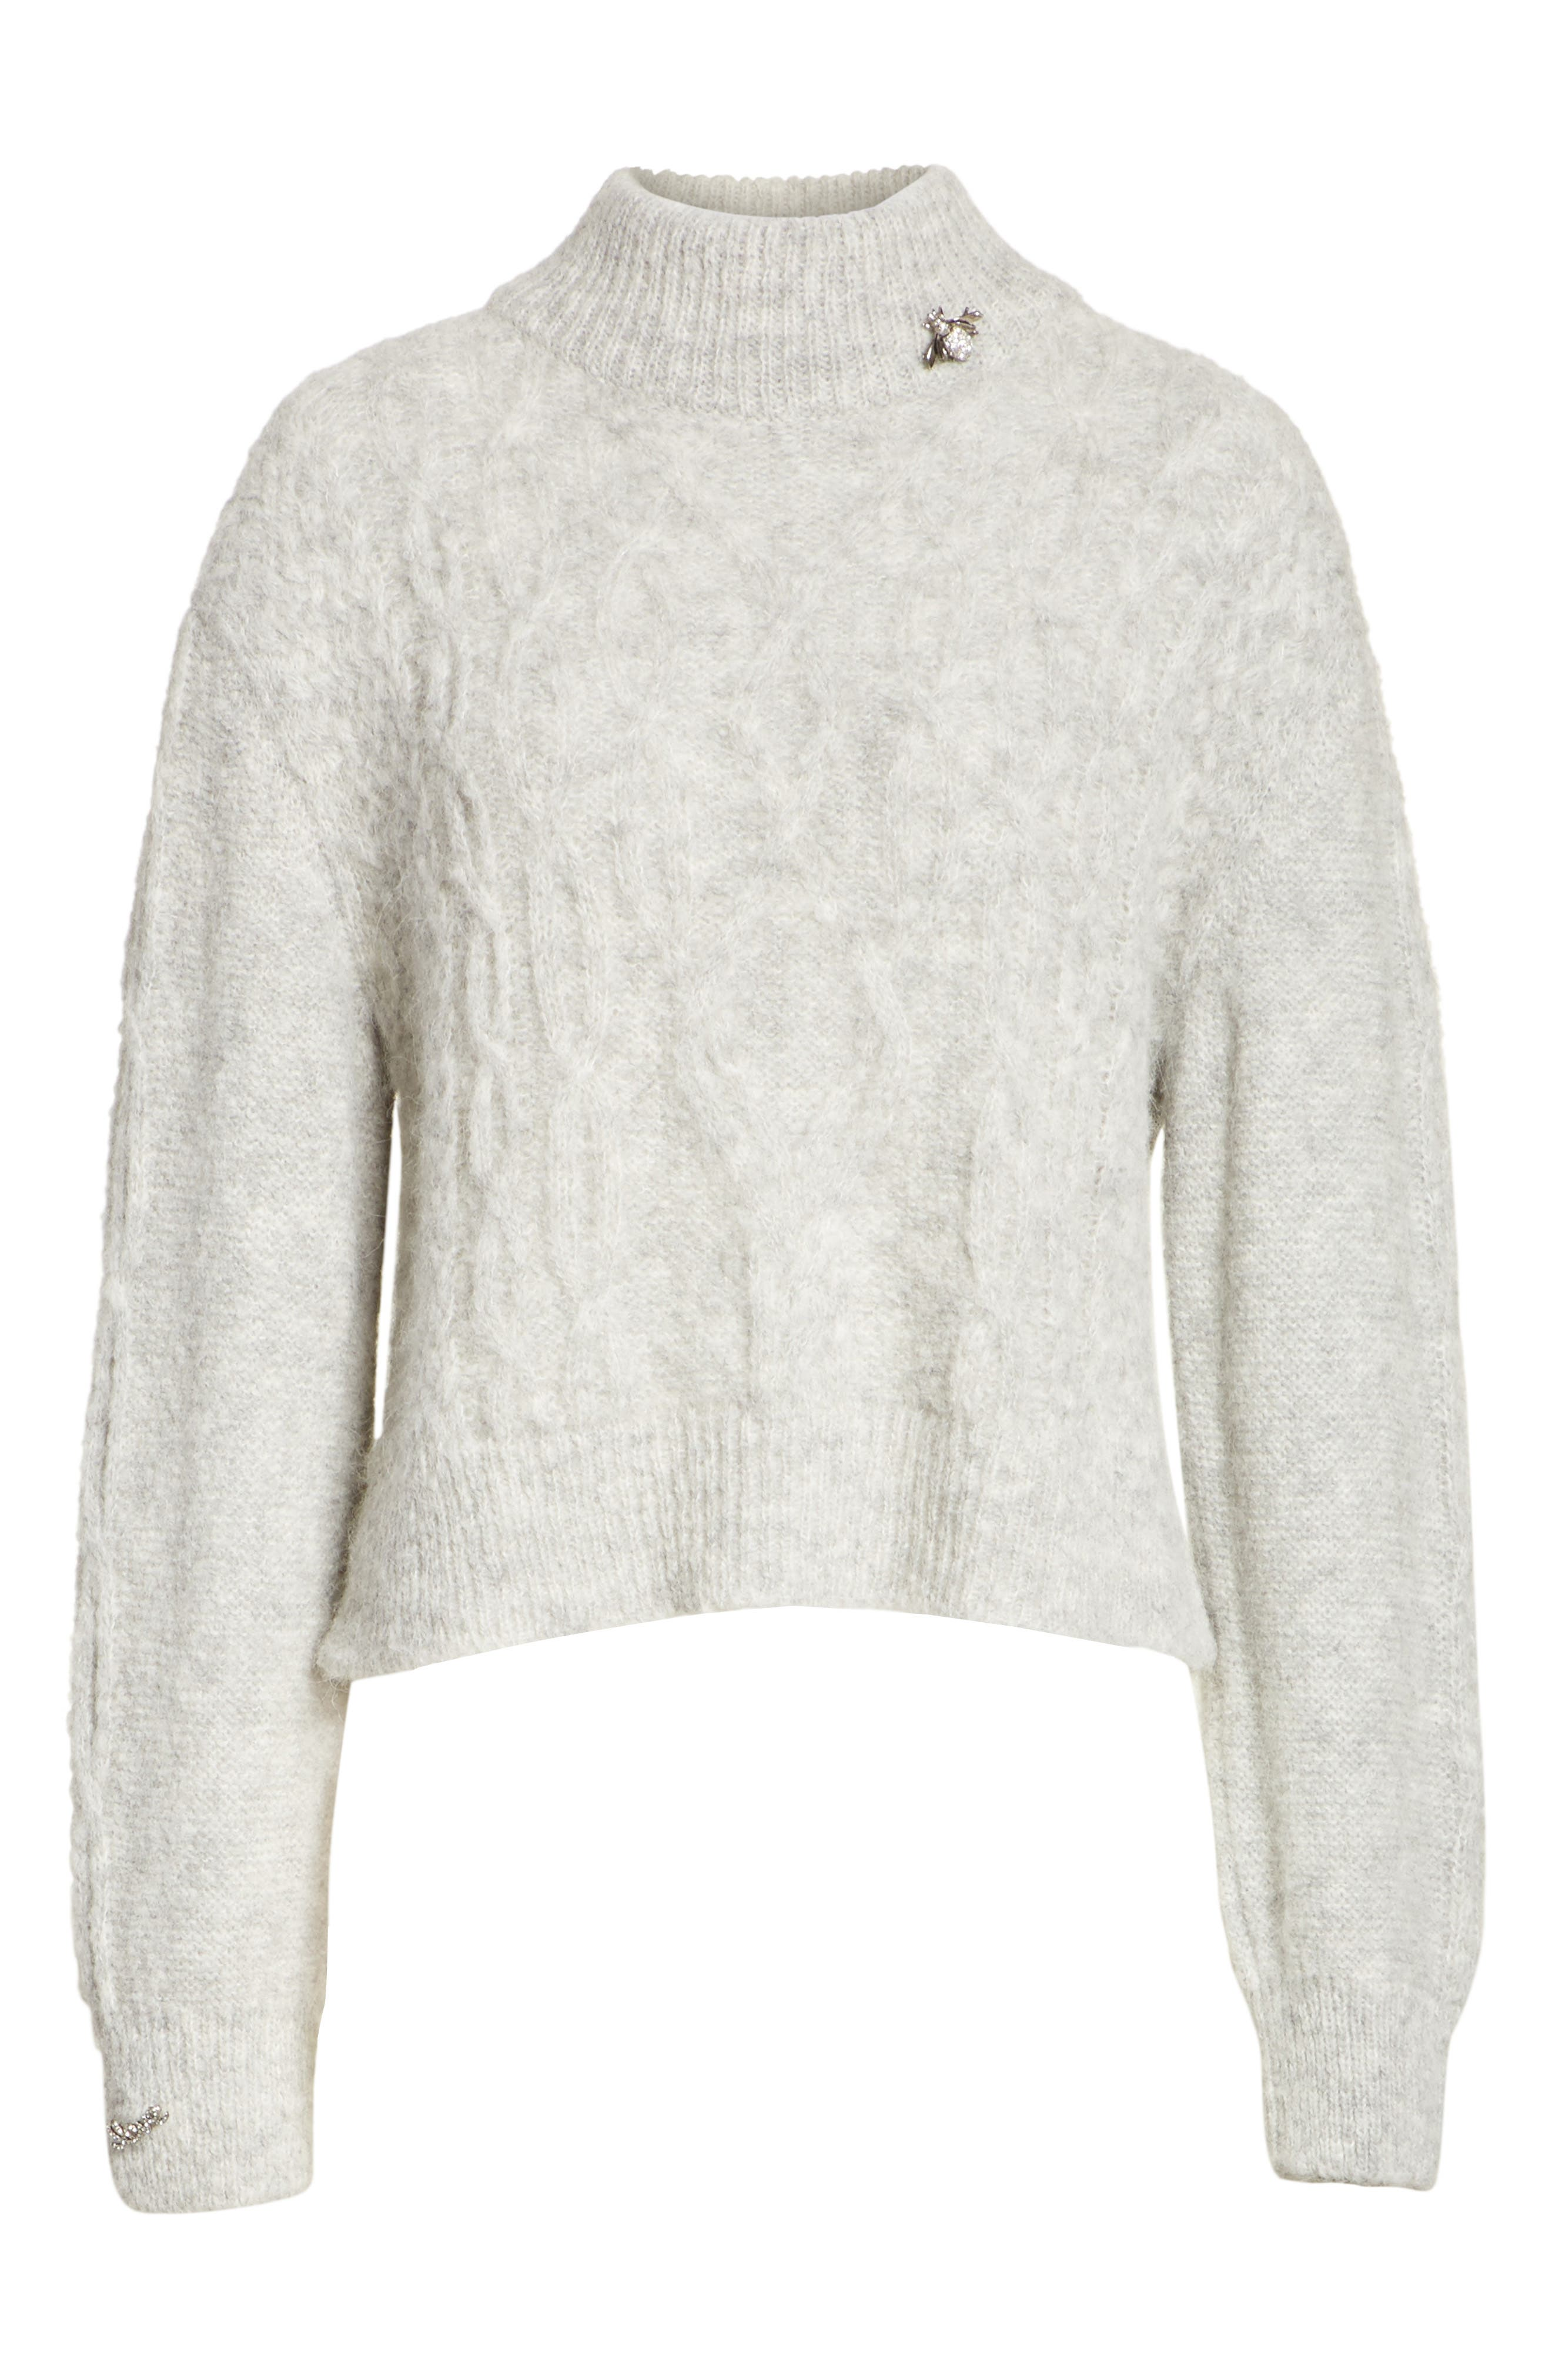 Garlan Mock Neck Sweater,                             Alternate thumbnail 6, color,                             051